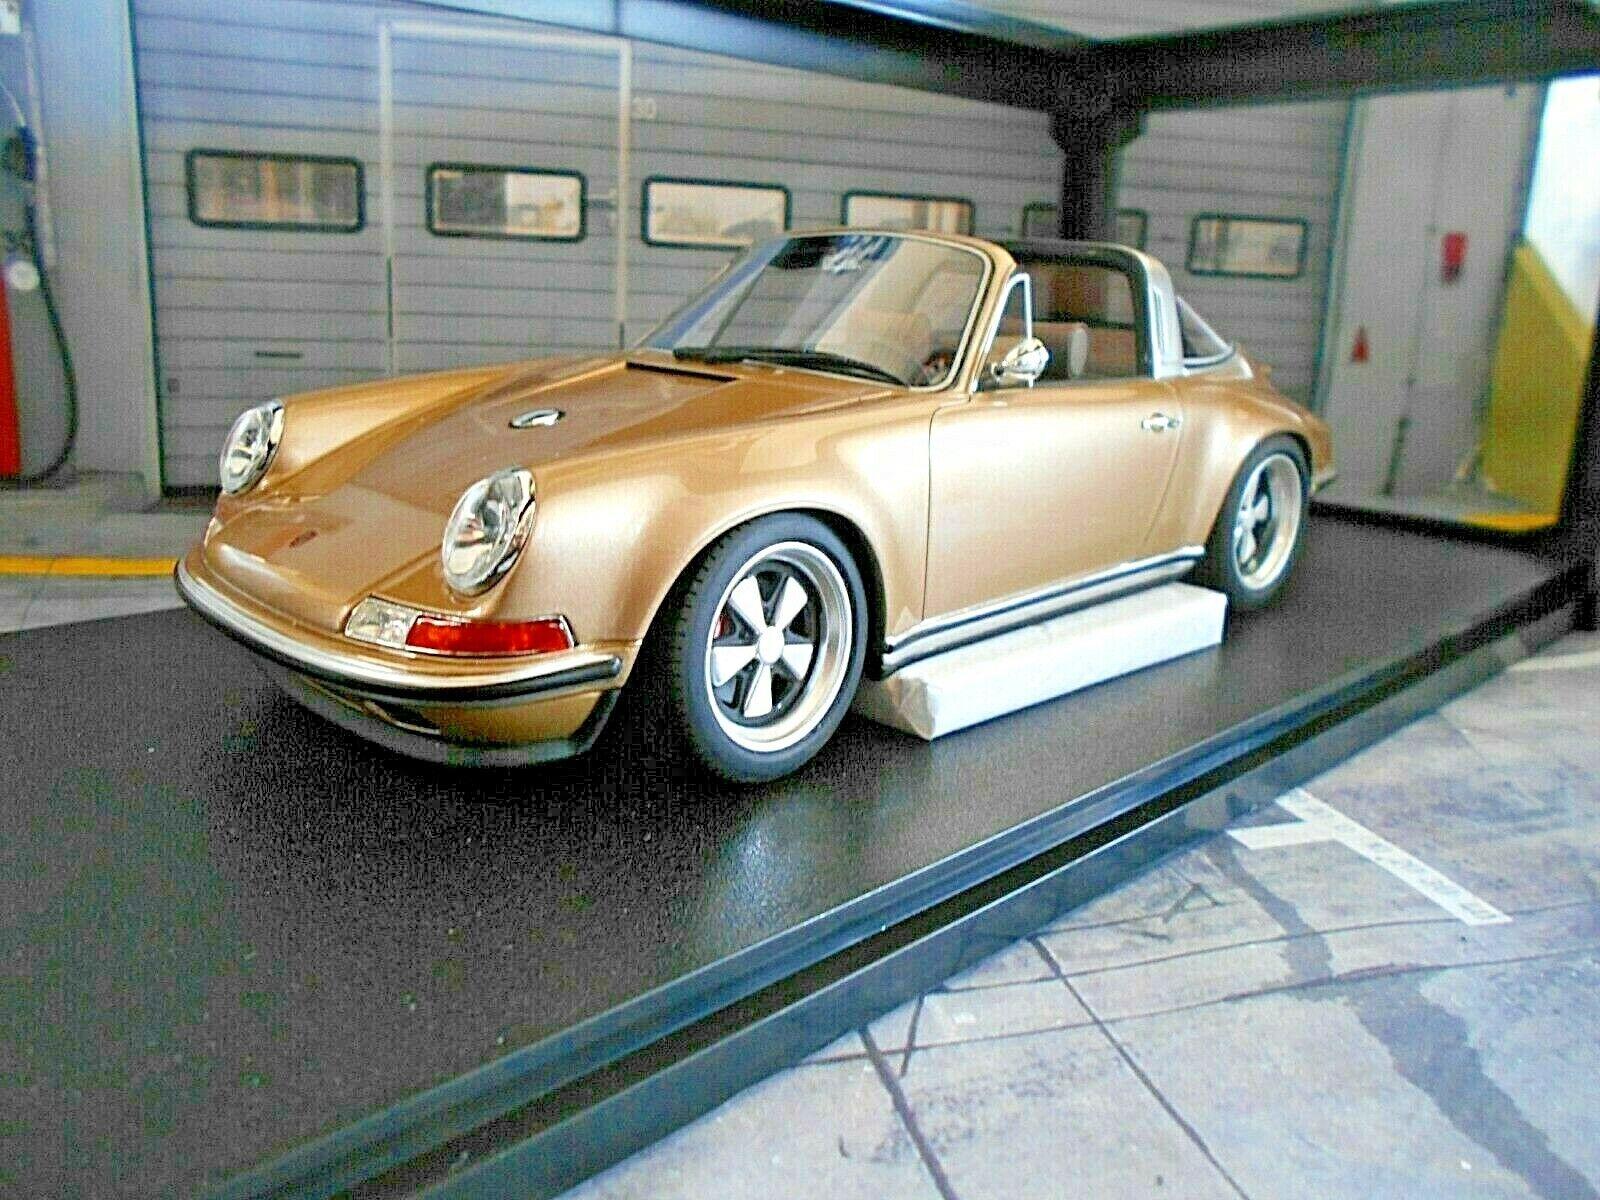 PORSCHE Singer Tuning 911 964 Targa Gold met 1990 Resin CULT Scale 1 18